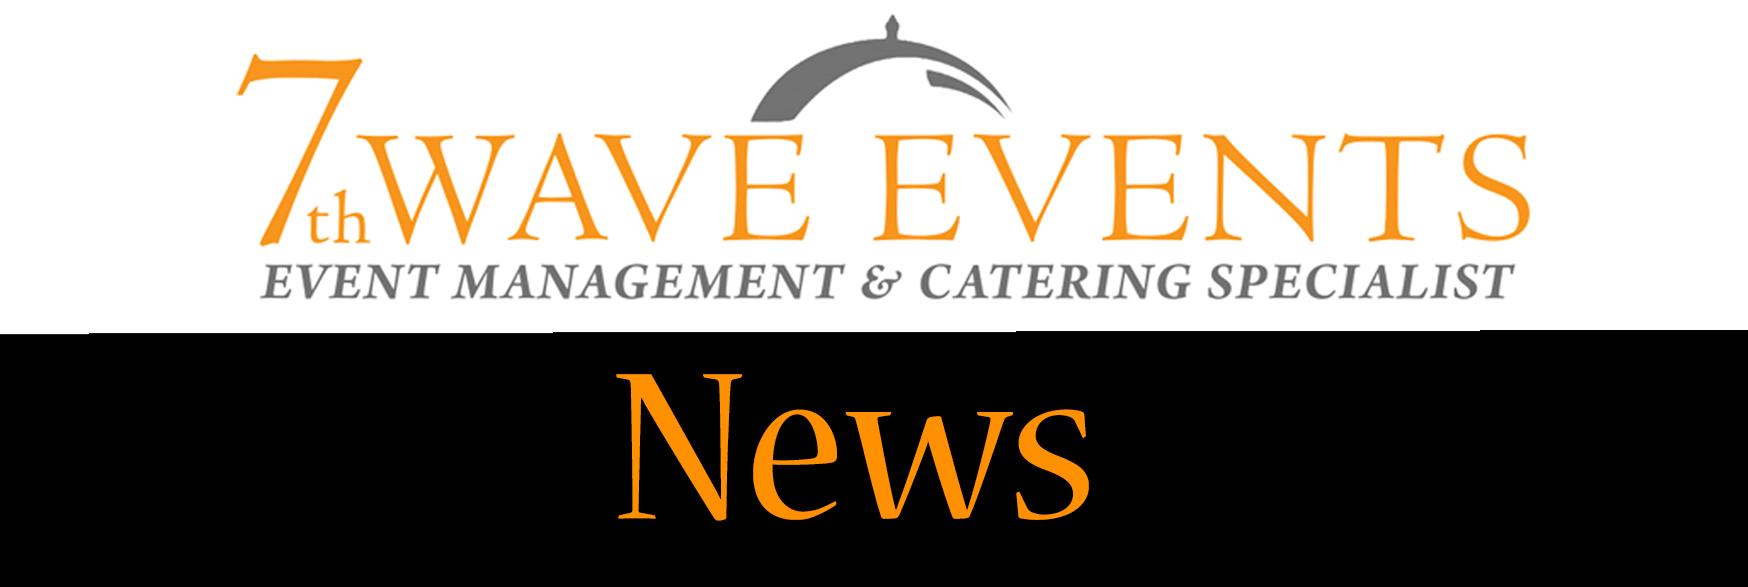 7th Wave News